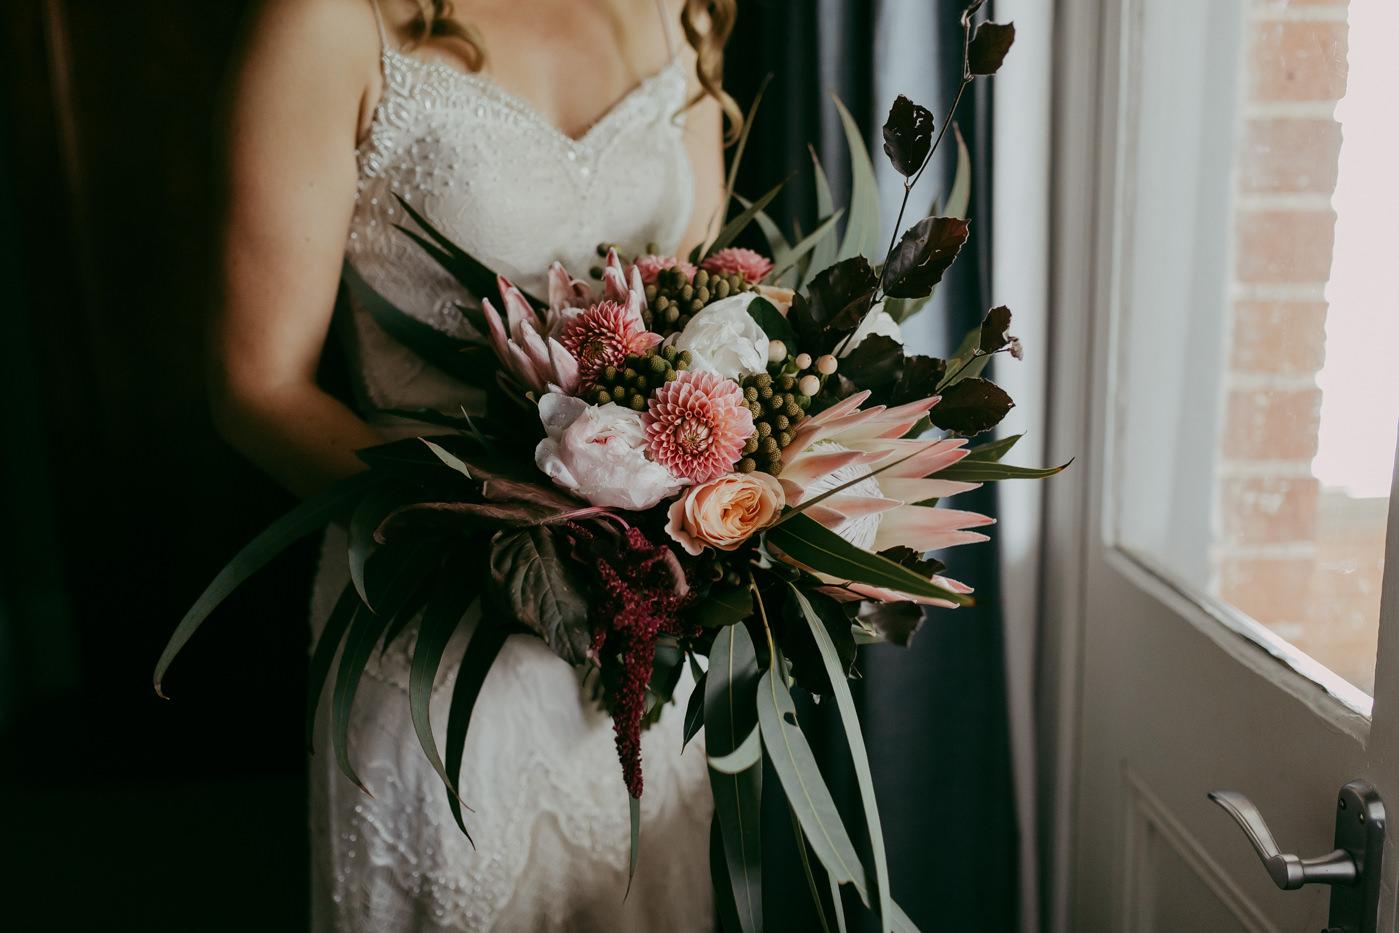 Anthony & Eliet - Wagga Wagga Wedding - Country NSW - Samantha Heather Photography-49.jpg